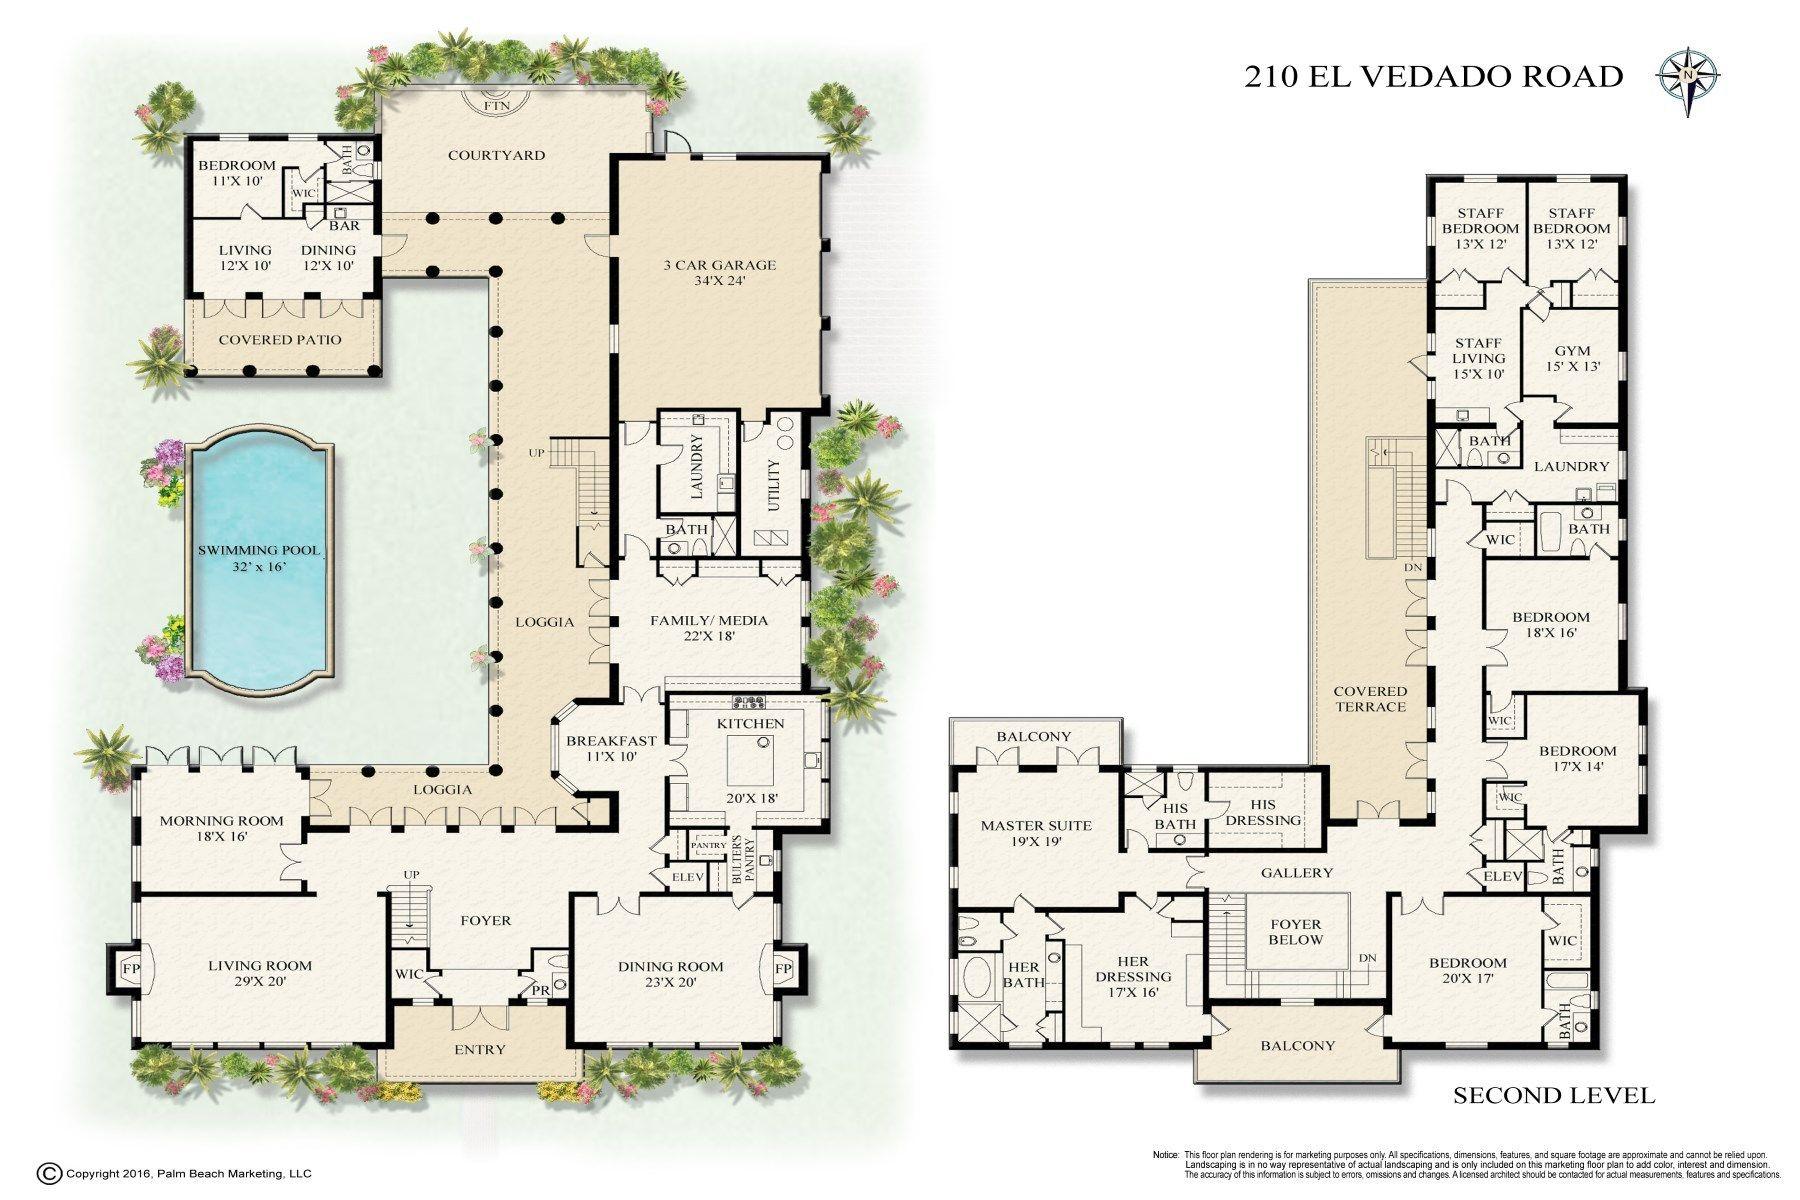 210 El Vedado Rd Palm Beach Fl Luxury House Plans Spanish Style Architecture House Plans